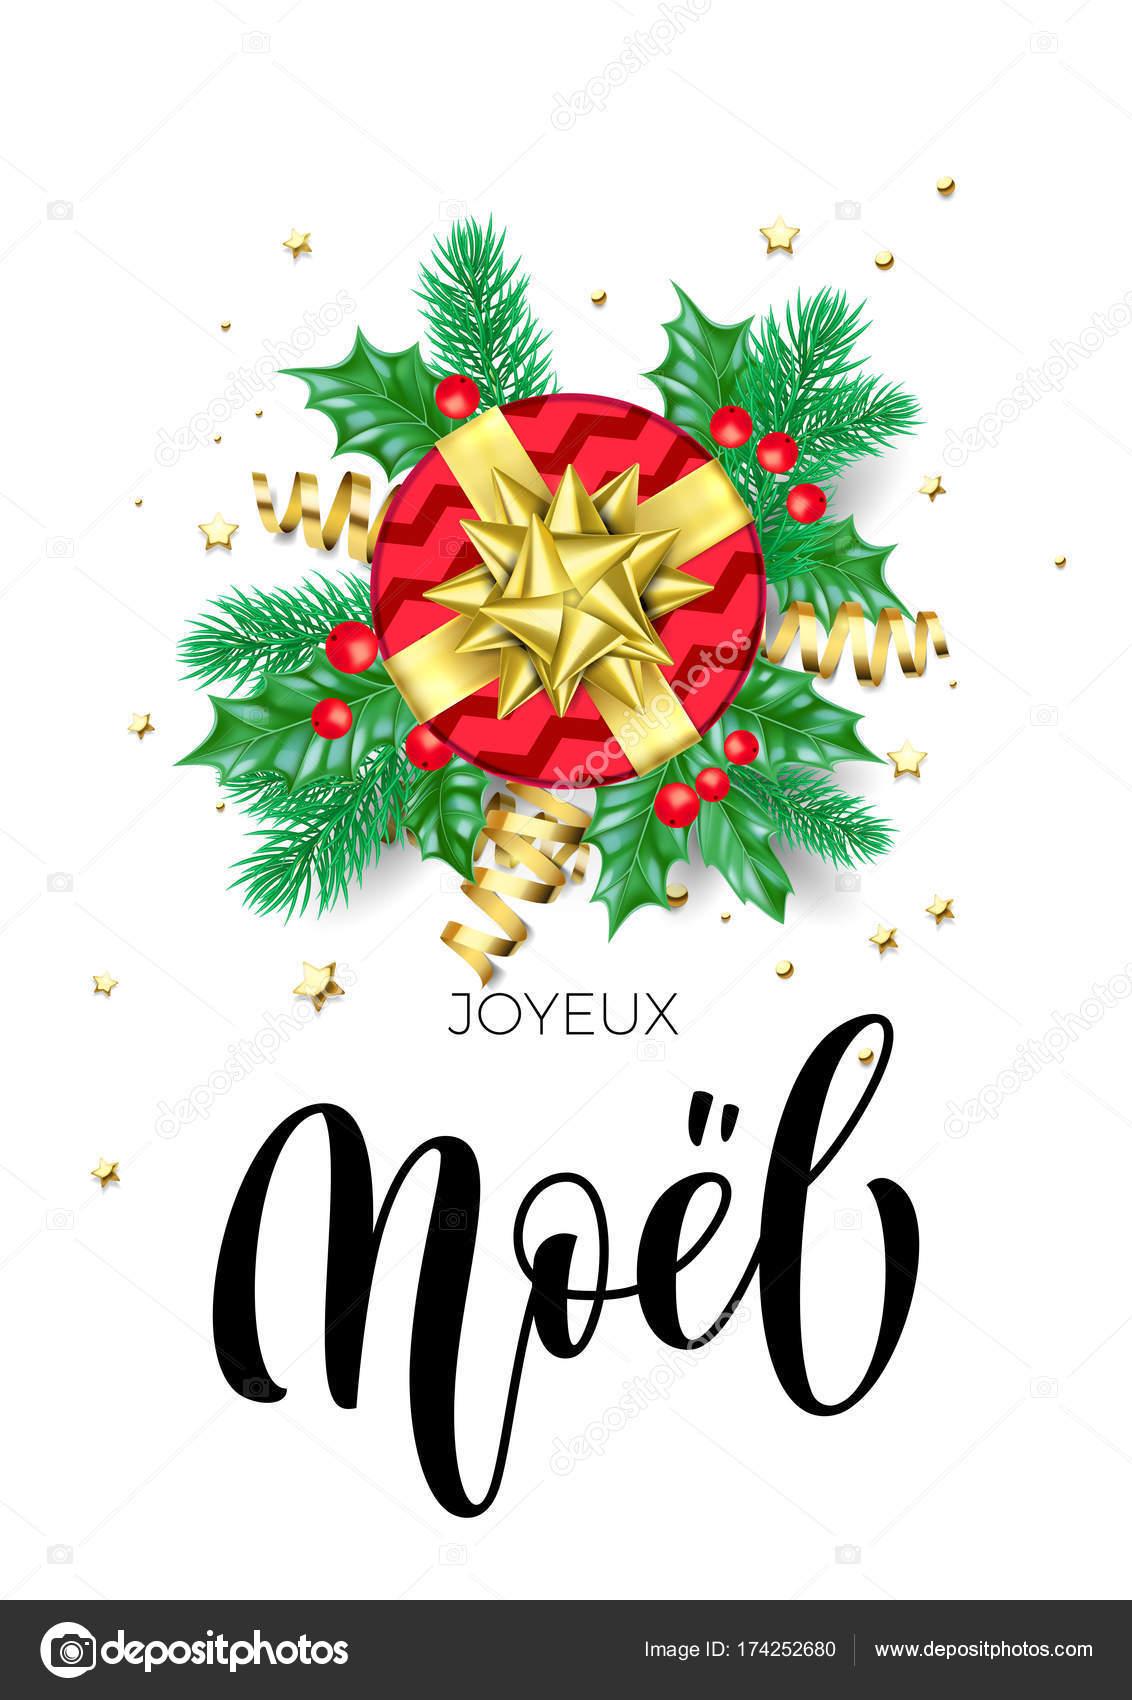 Joyeux Noel Clipart.Merry Christmas French Joyeux Noel Trendy Quote Calligraphy